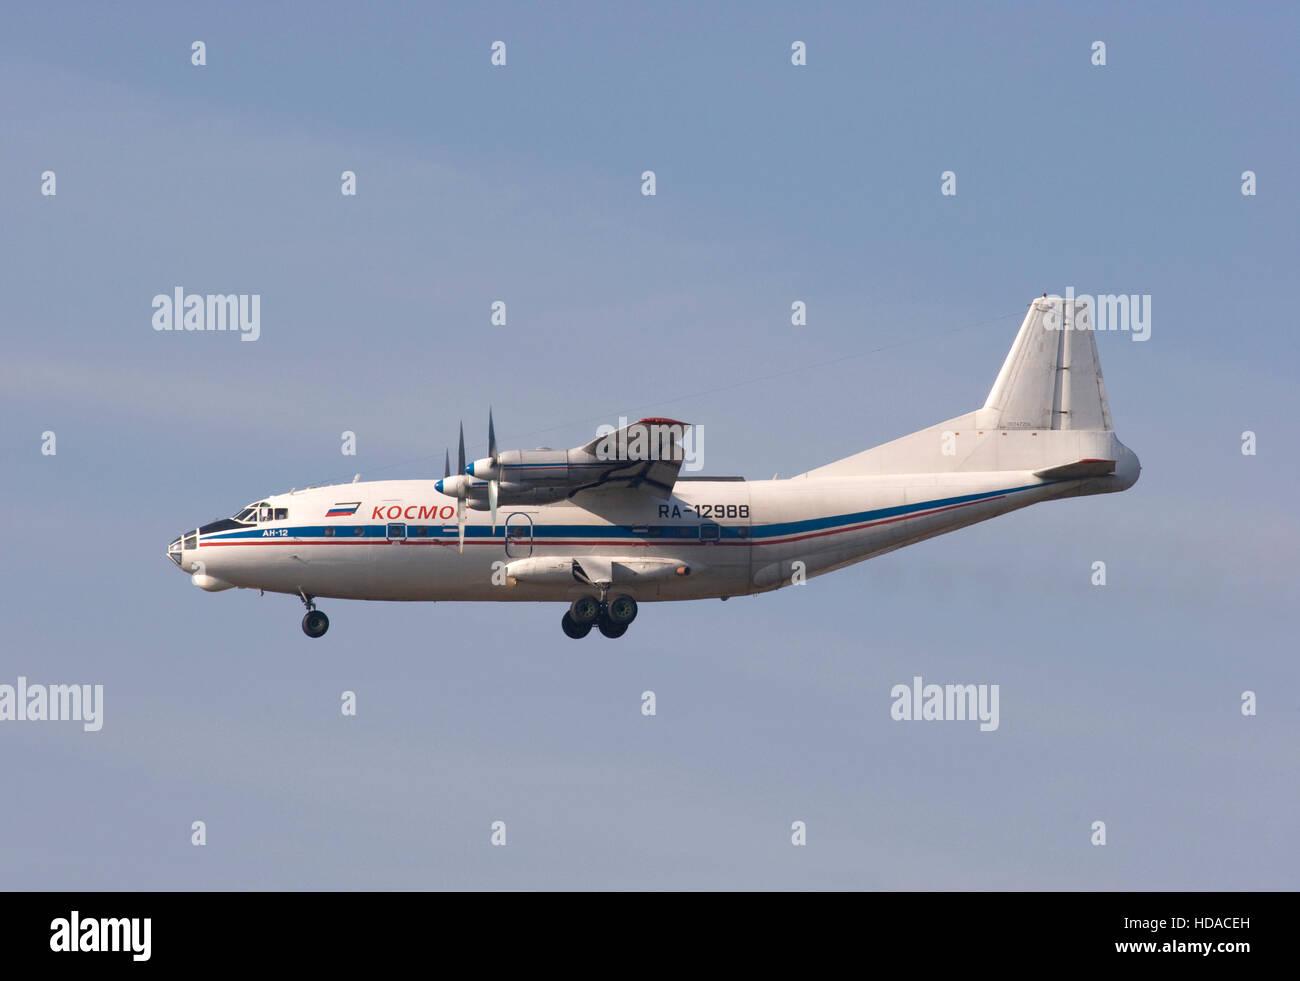 RA-12988 Kosmos Aviation Antonov An-12B landing at London Stansted. 12th October 2008. - Stock Image